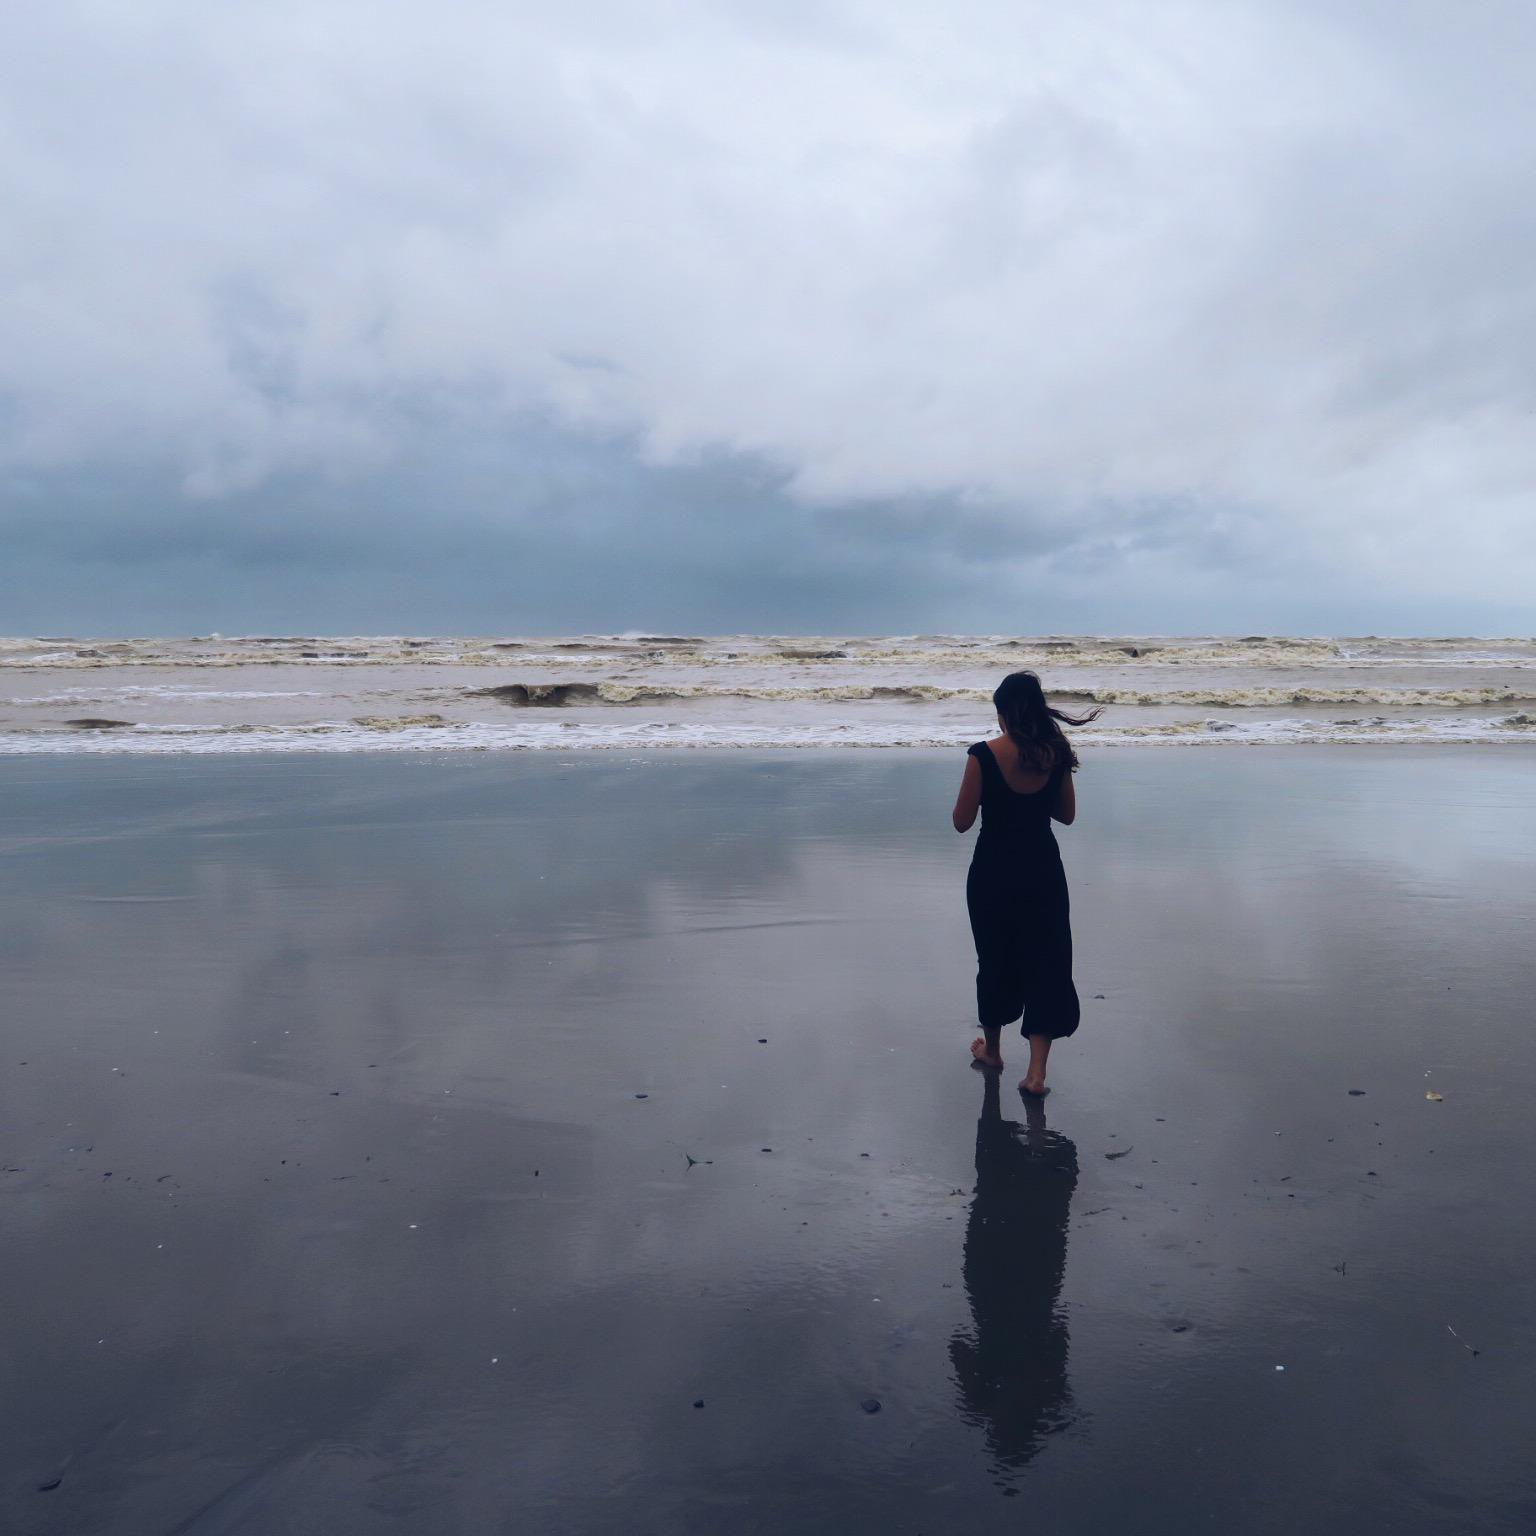 Beach walks in the rain